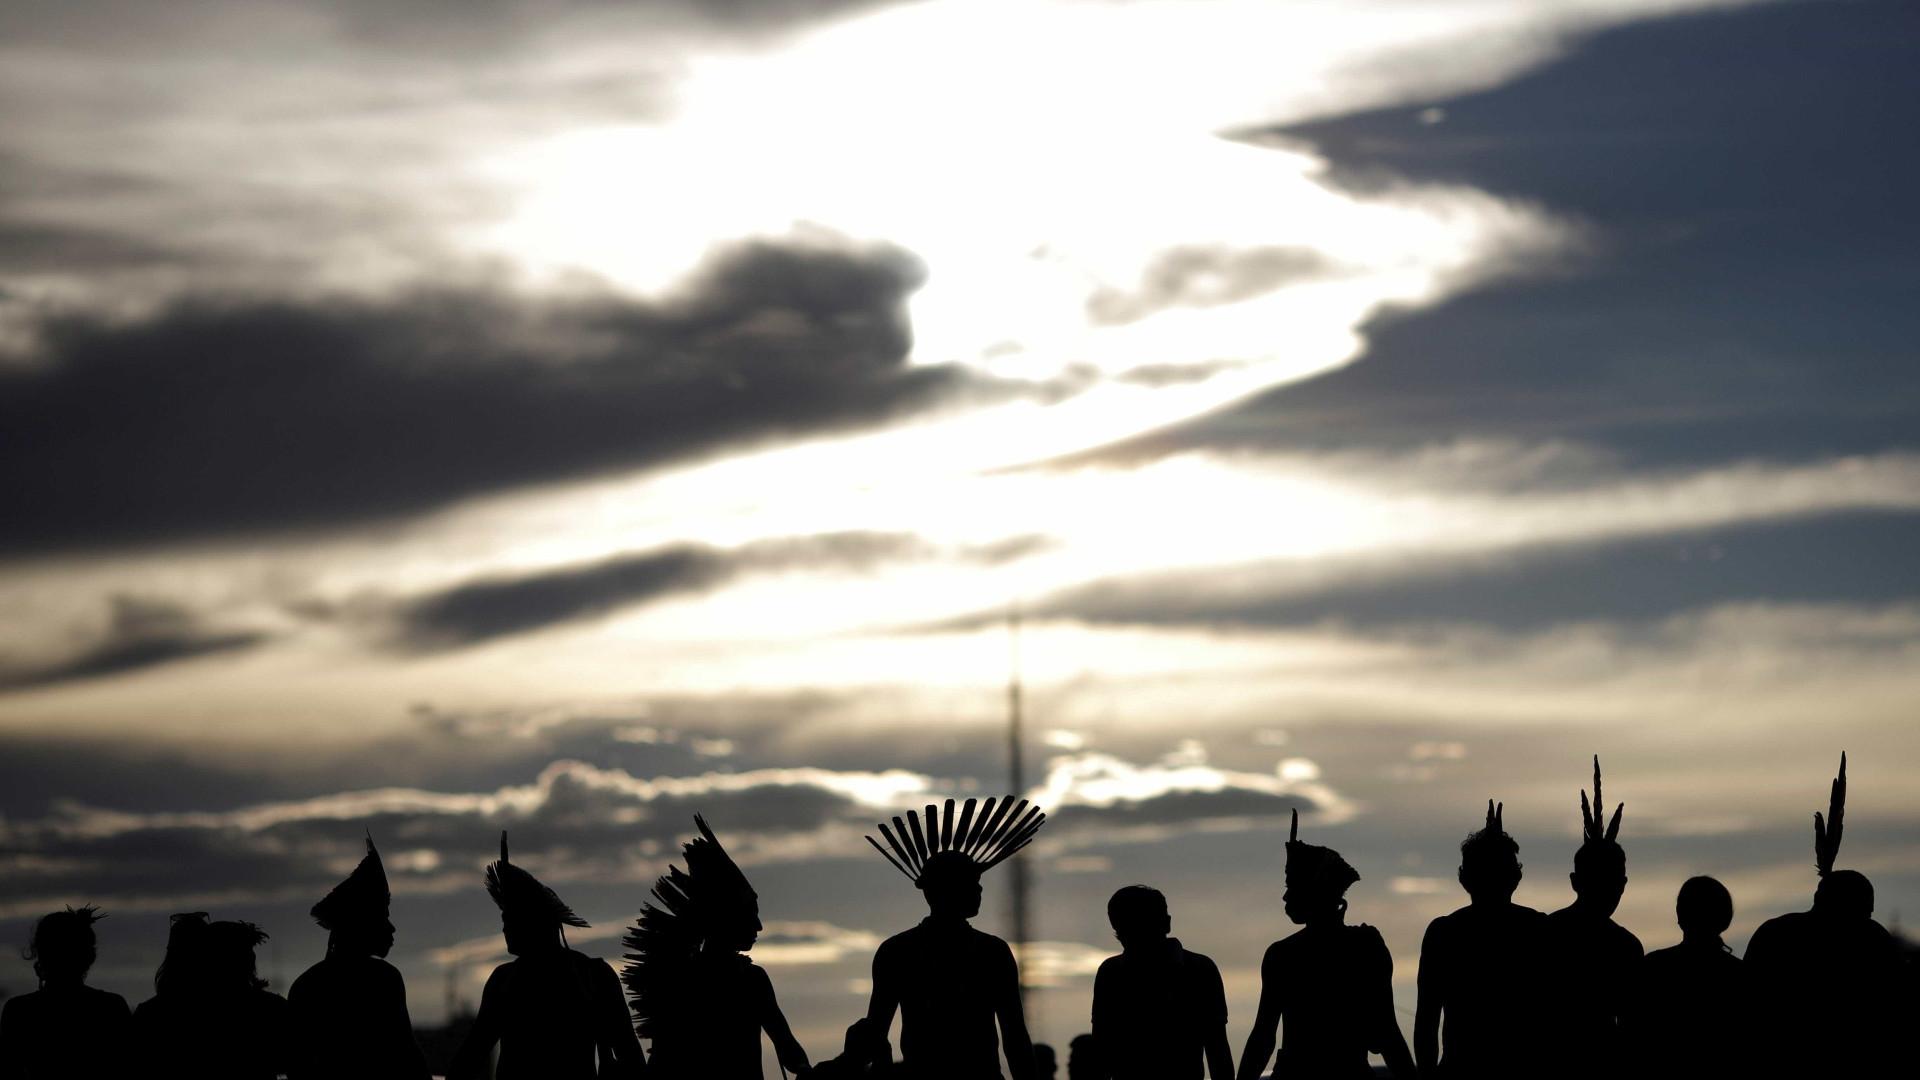 MPF confirma assassinato de indígenas de tribo isolada, diz agência